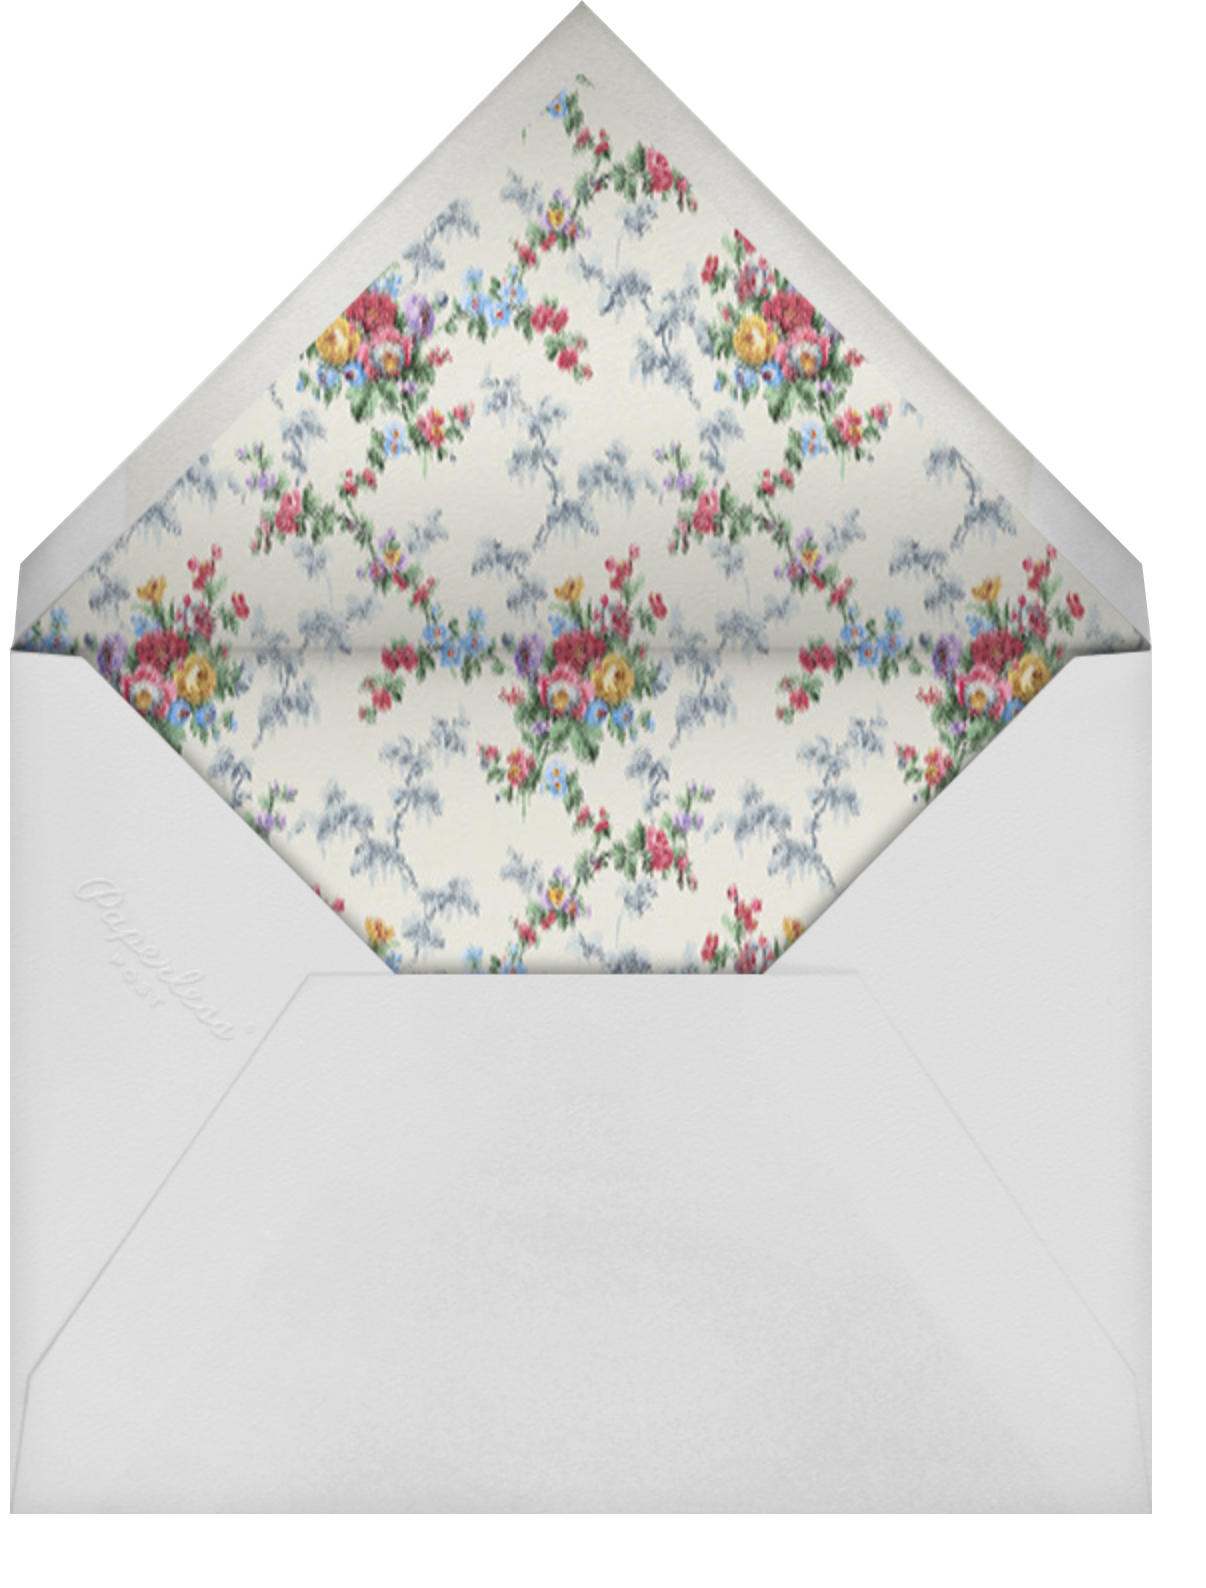 Violetta - Brock Collection - Mother's Day - envelope back